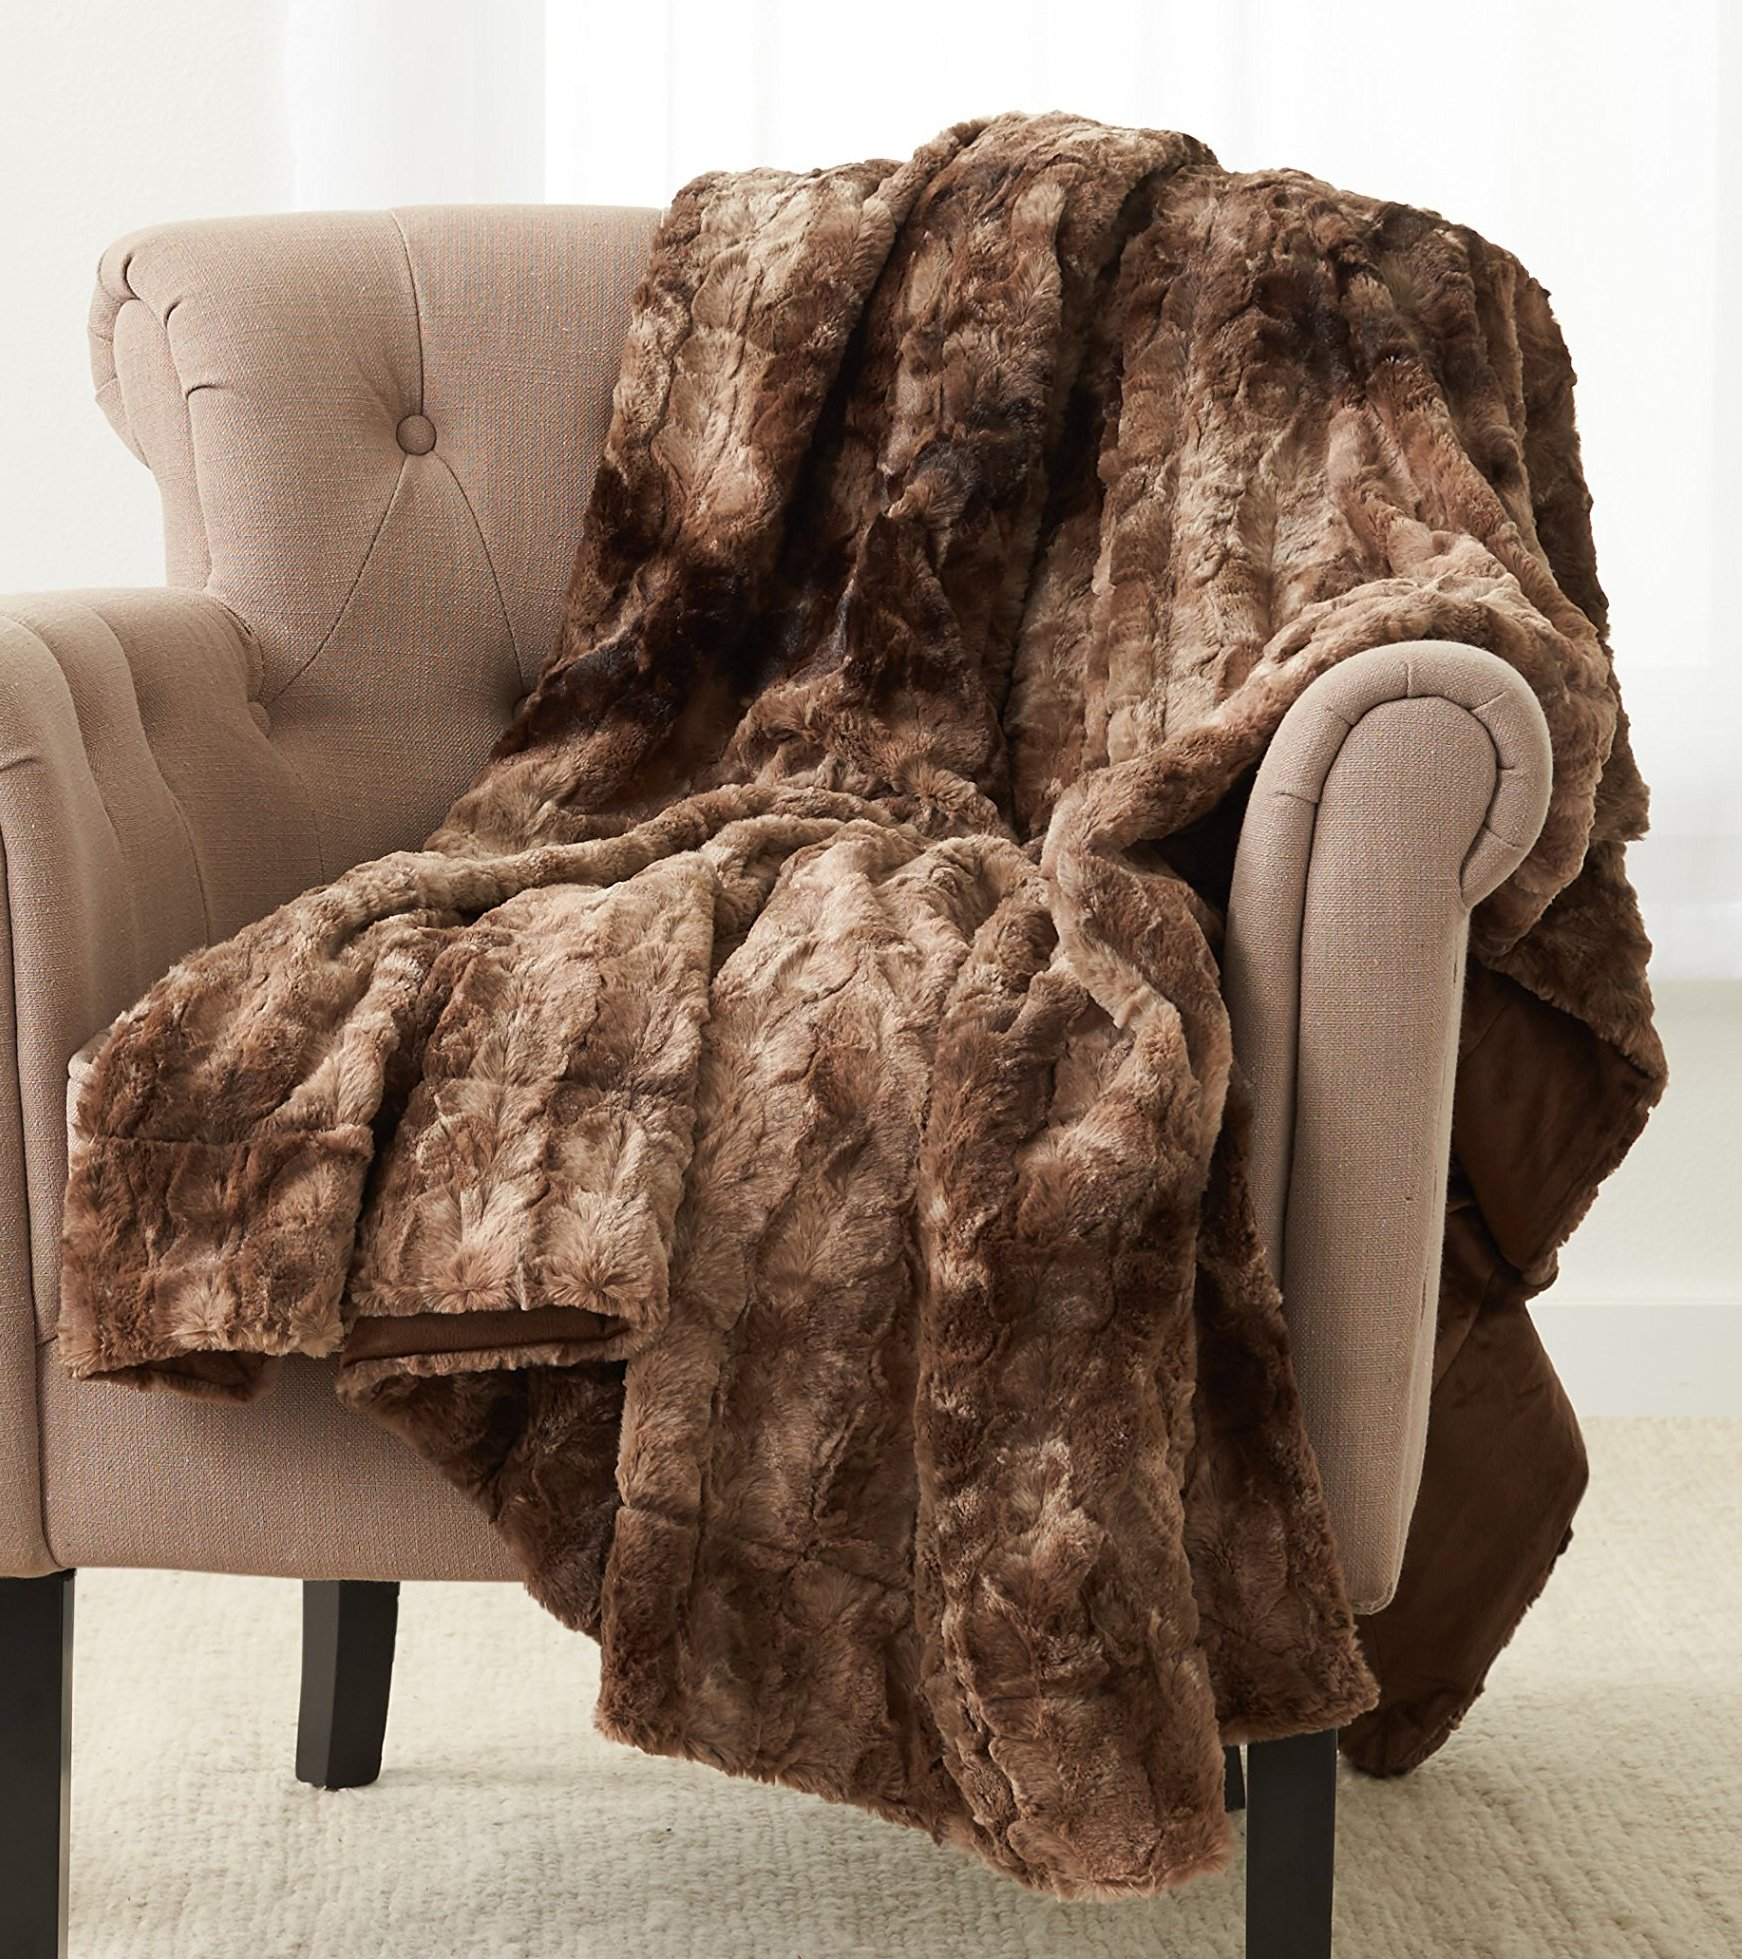 Pinzon Faux Fur Throw Blanket 50'' x 60'', Alpine Brown